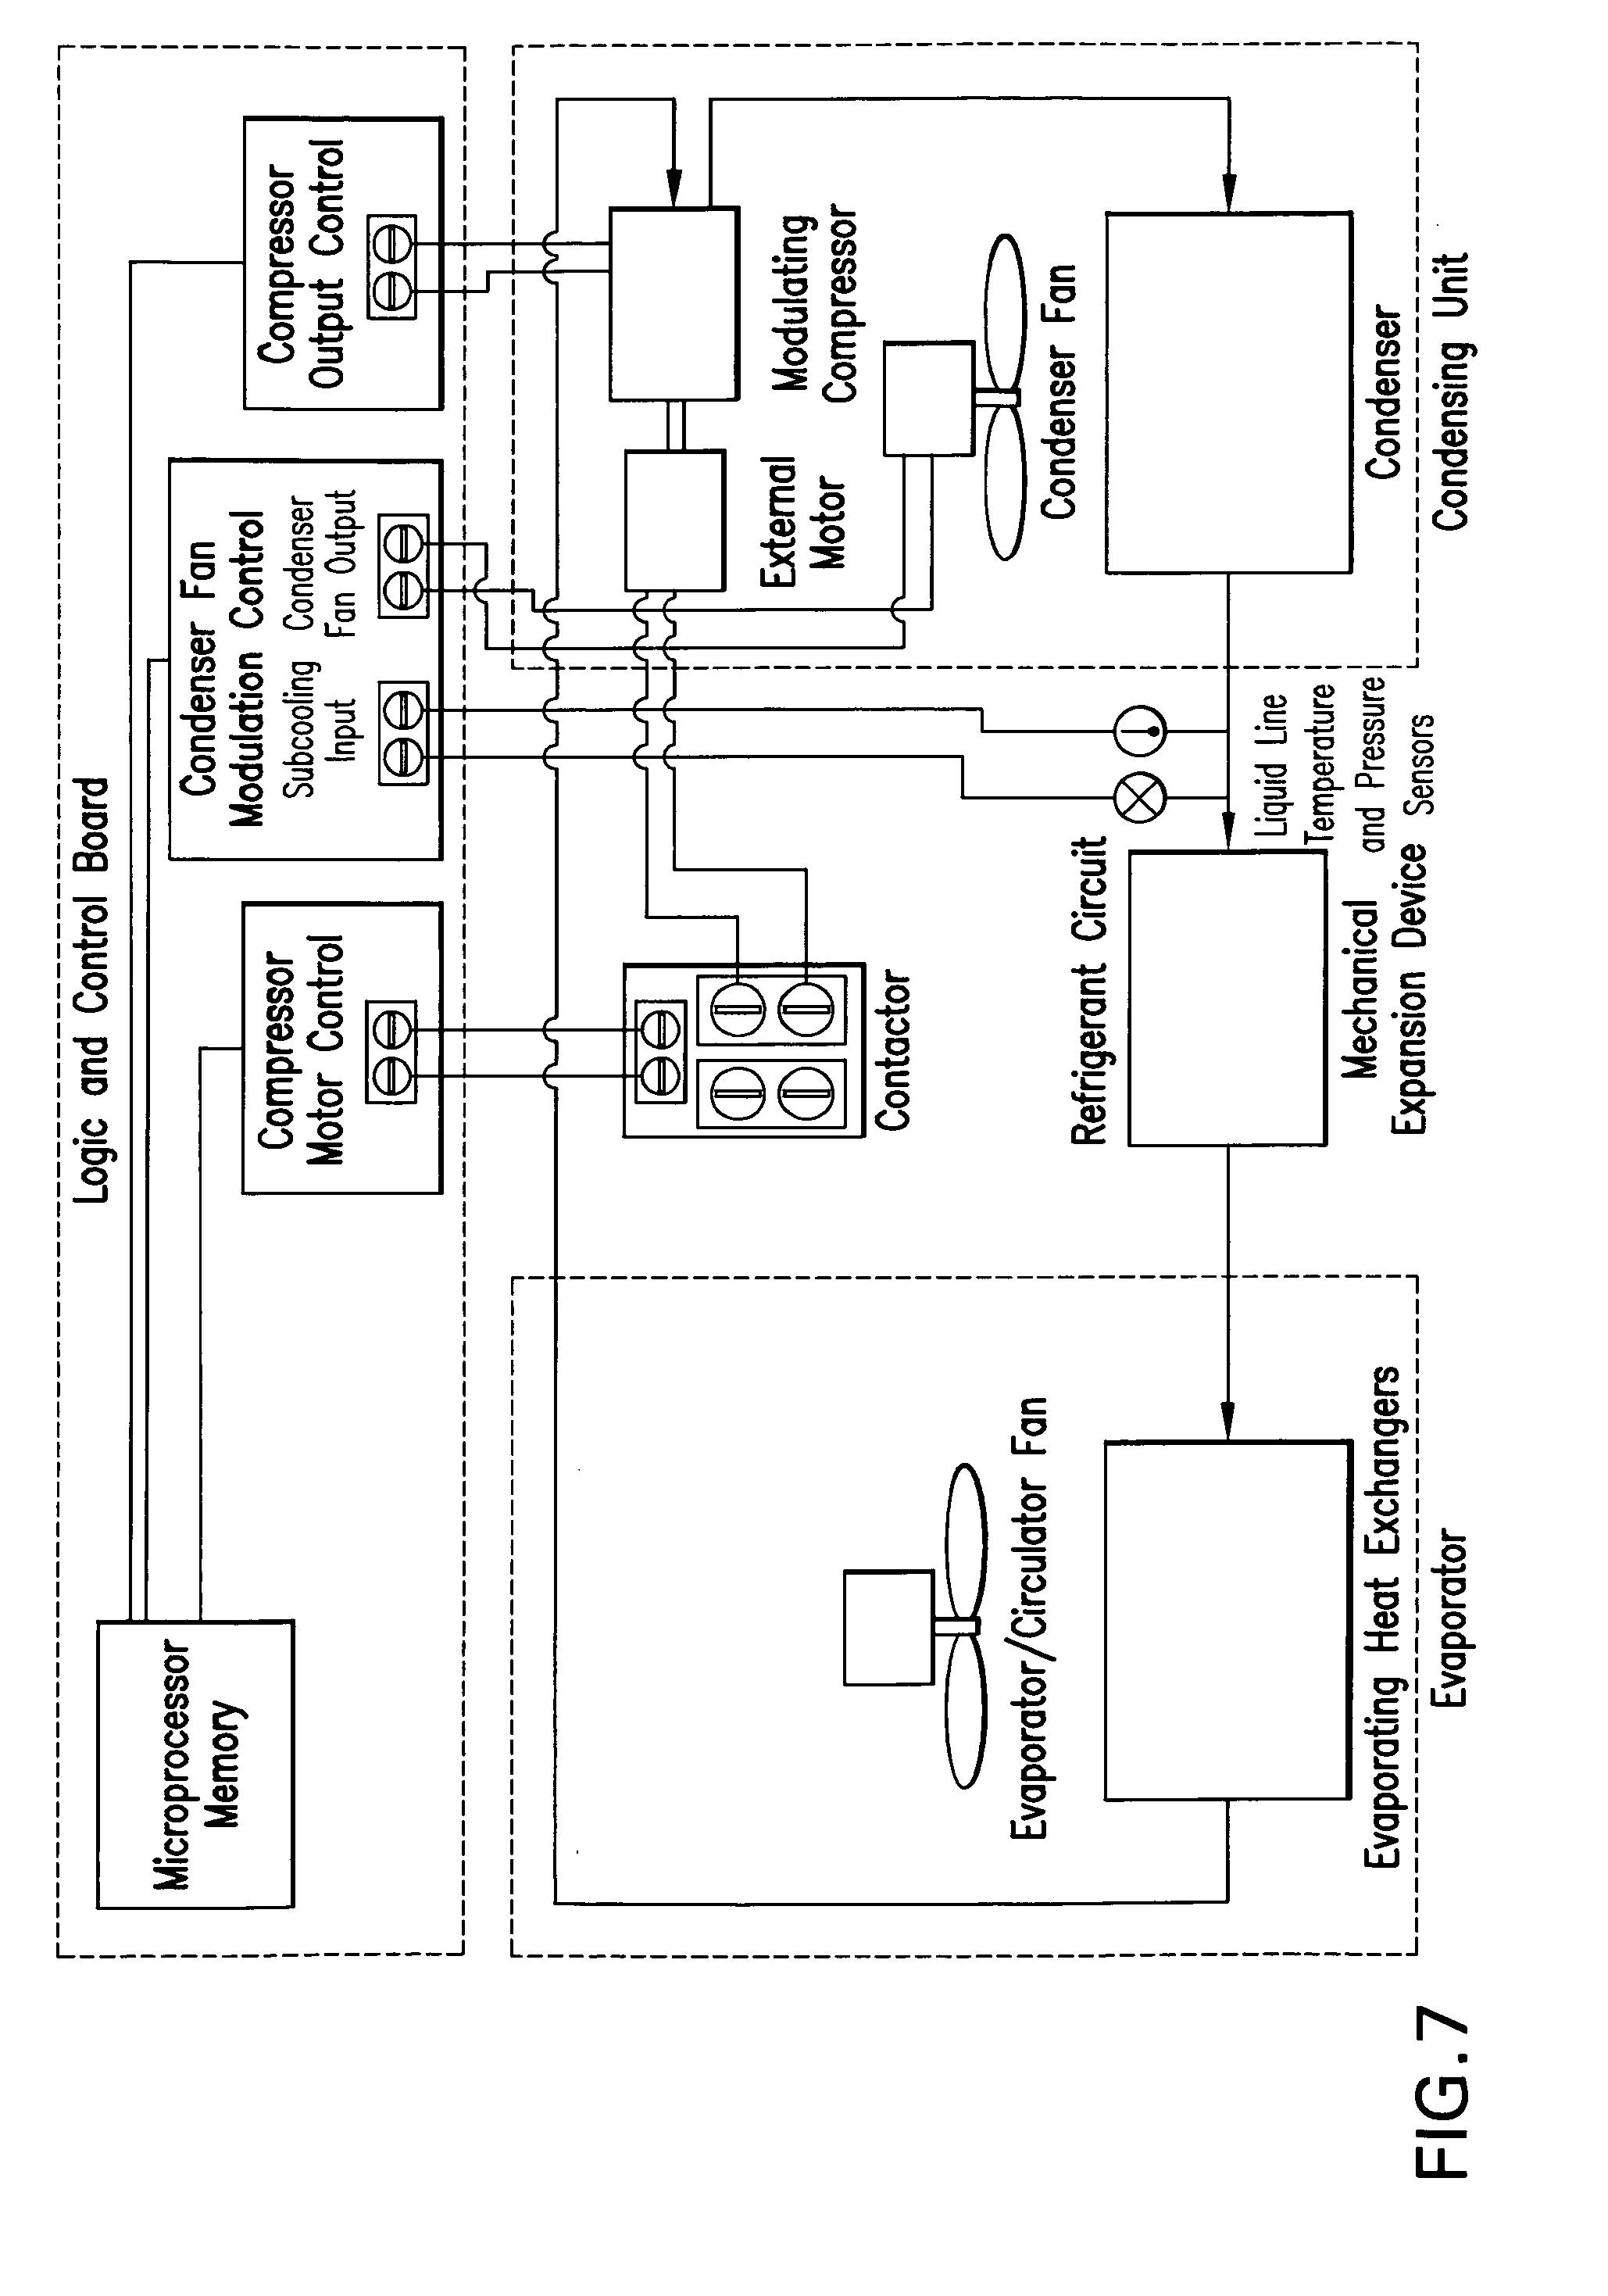 05 r1 engine diagram html